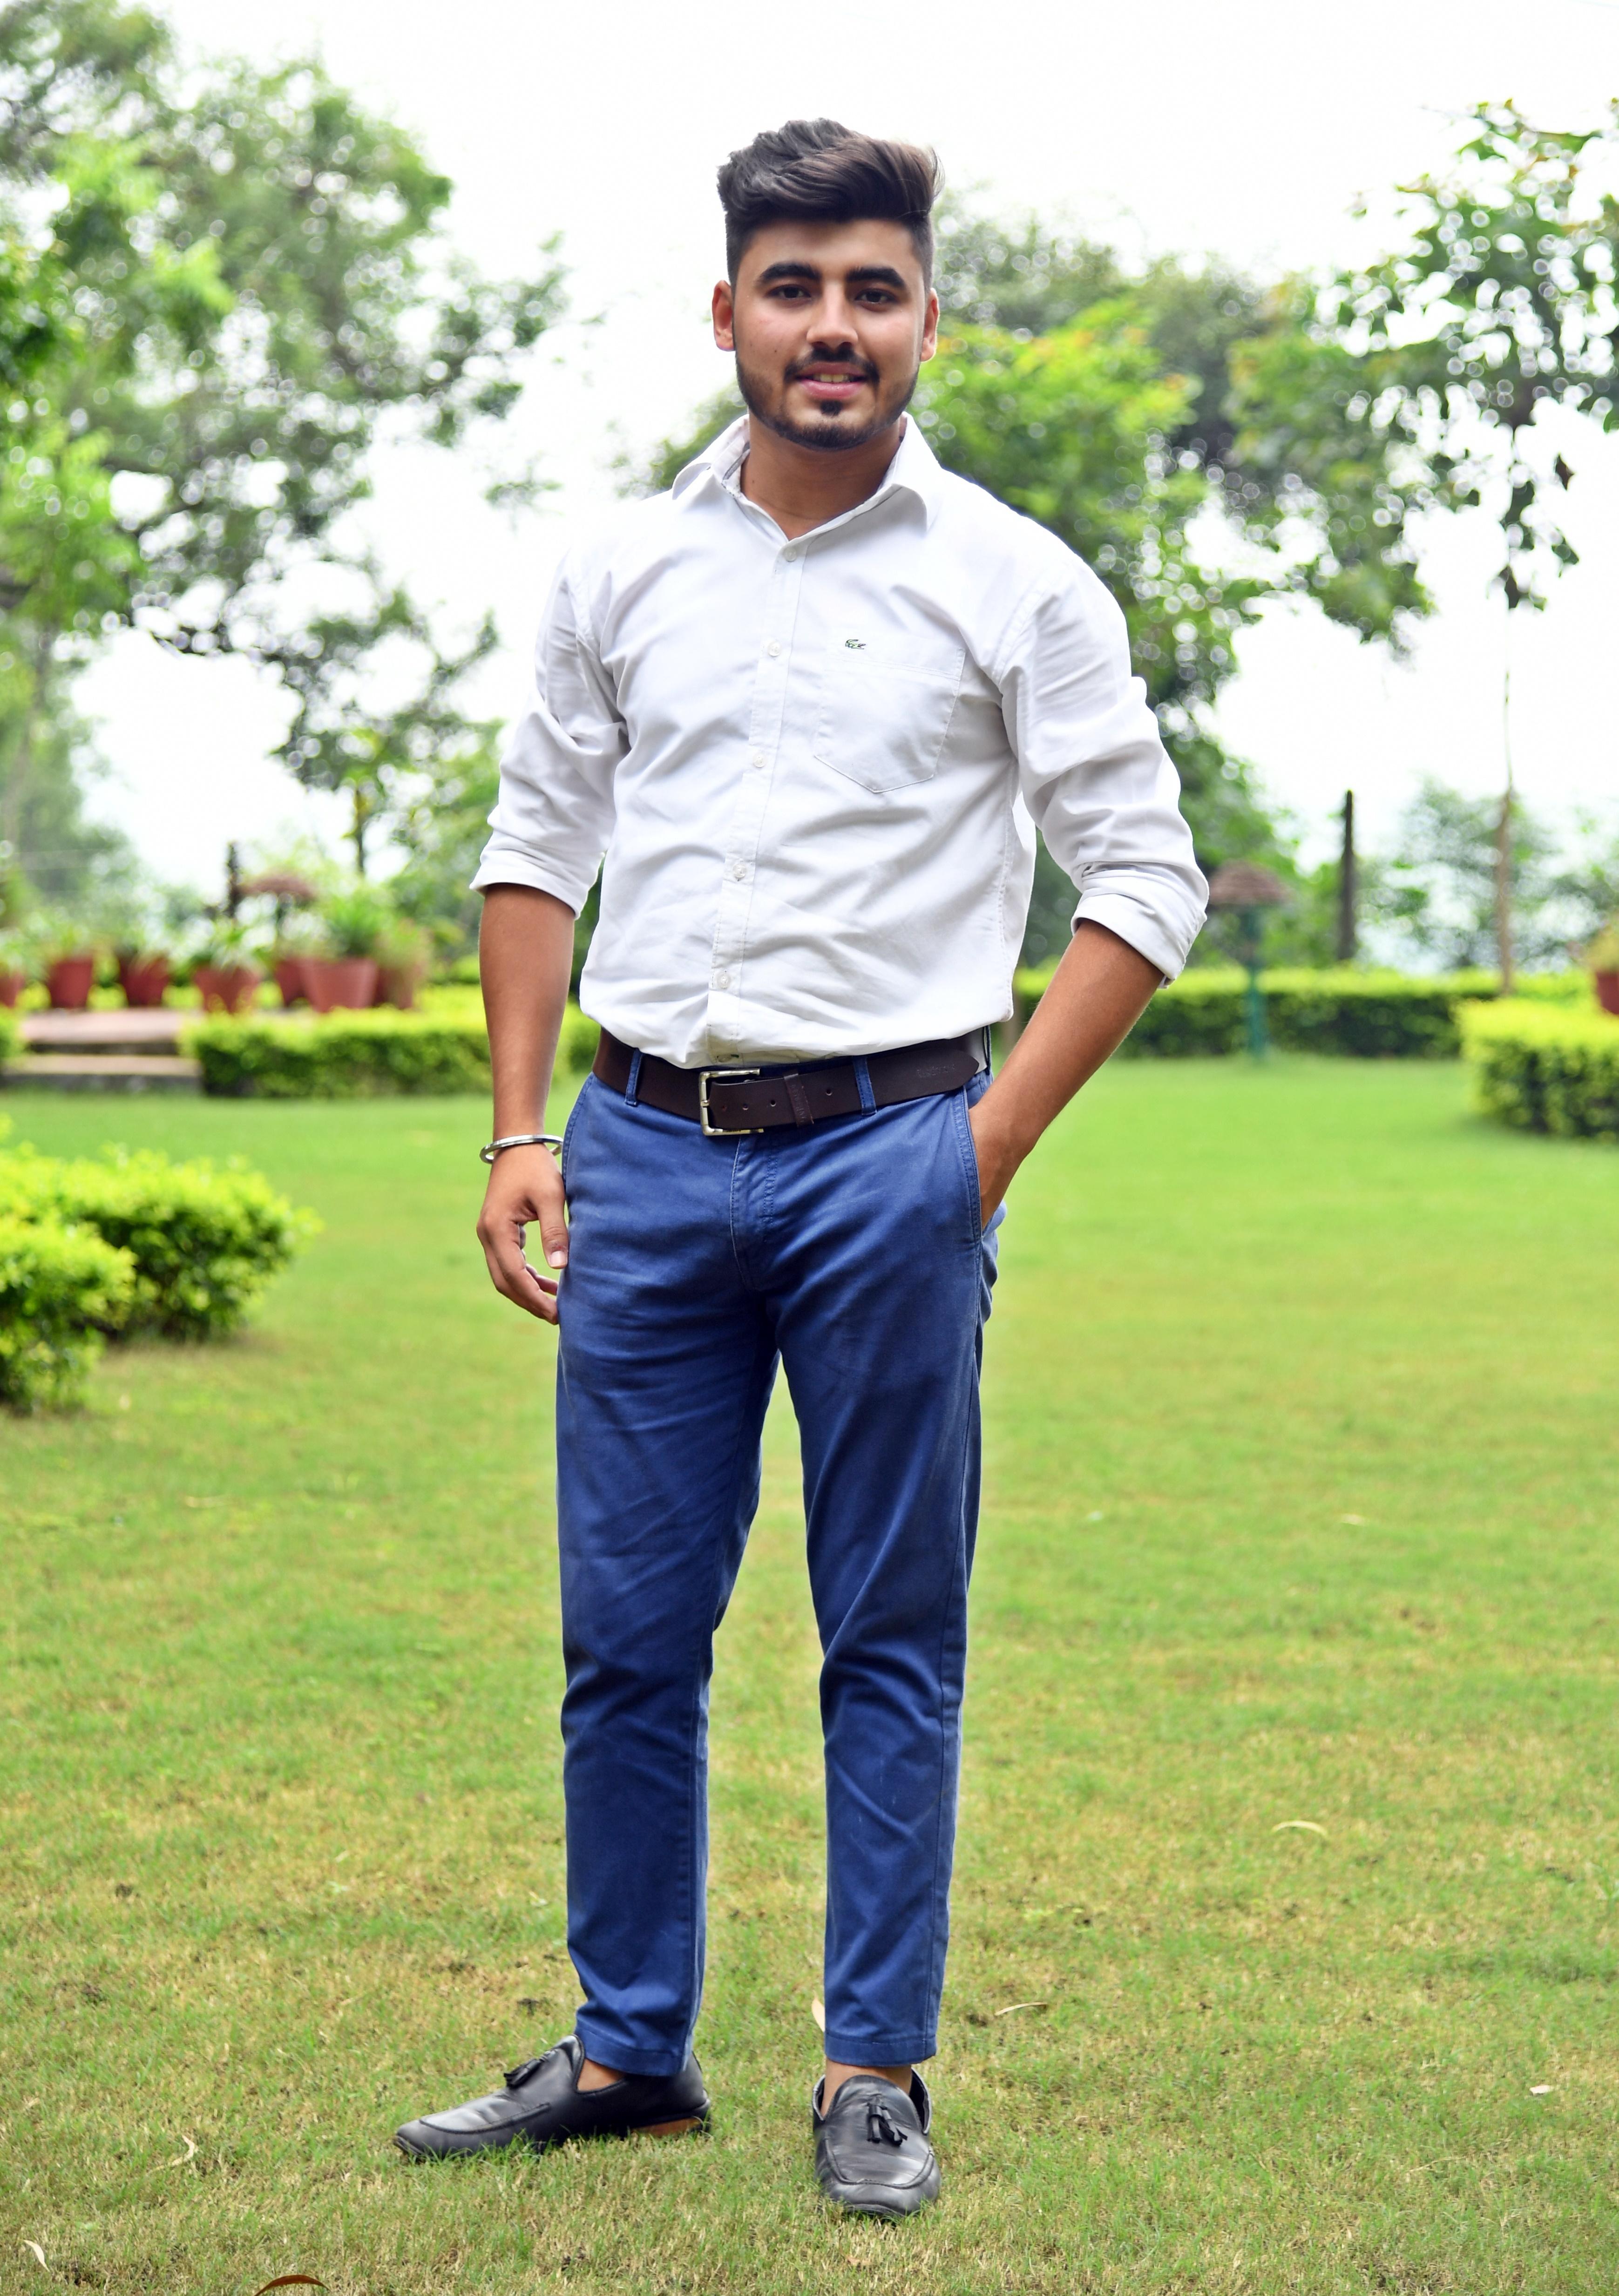 Jatin Sachdeva - EoIndia Startup stories